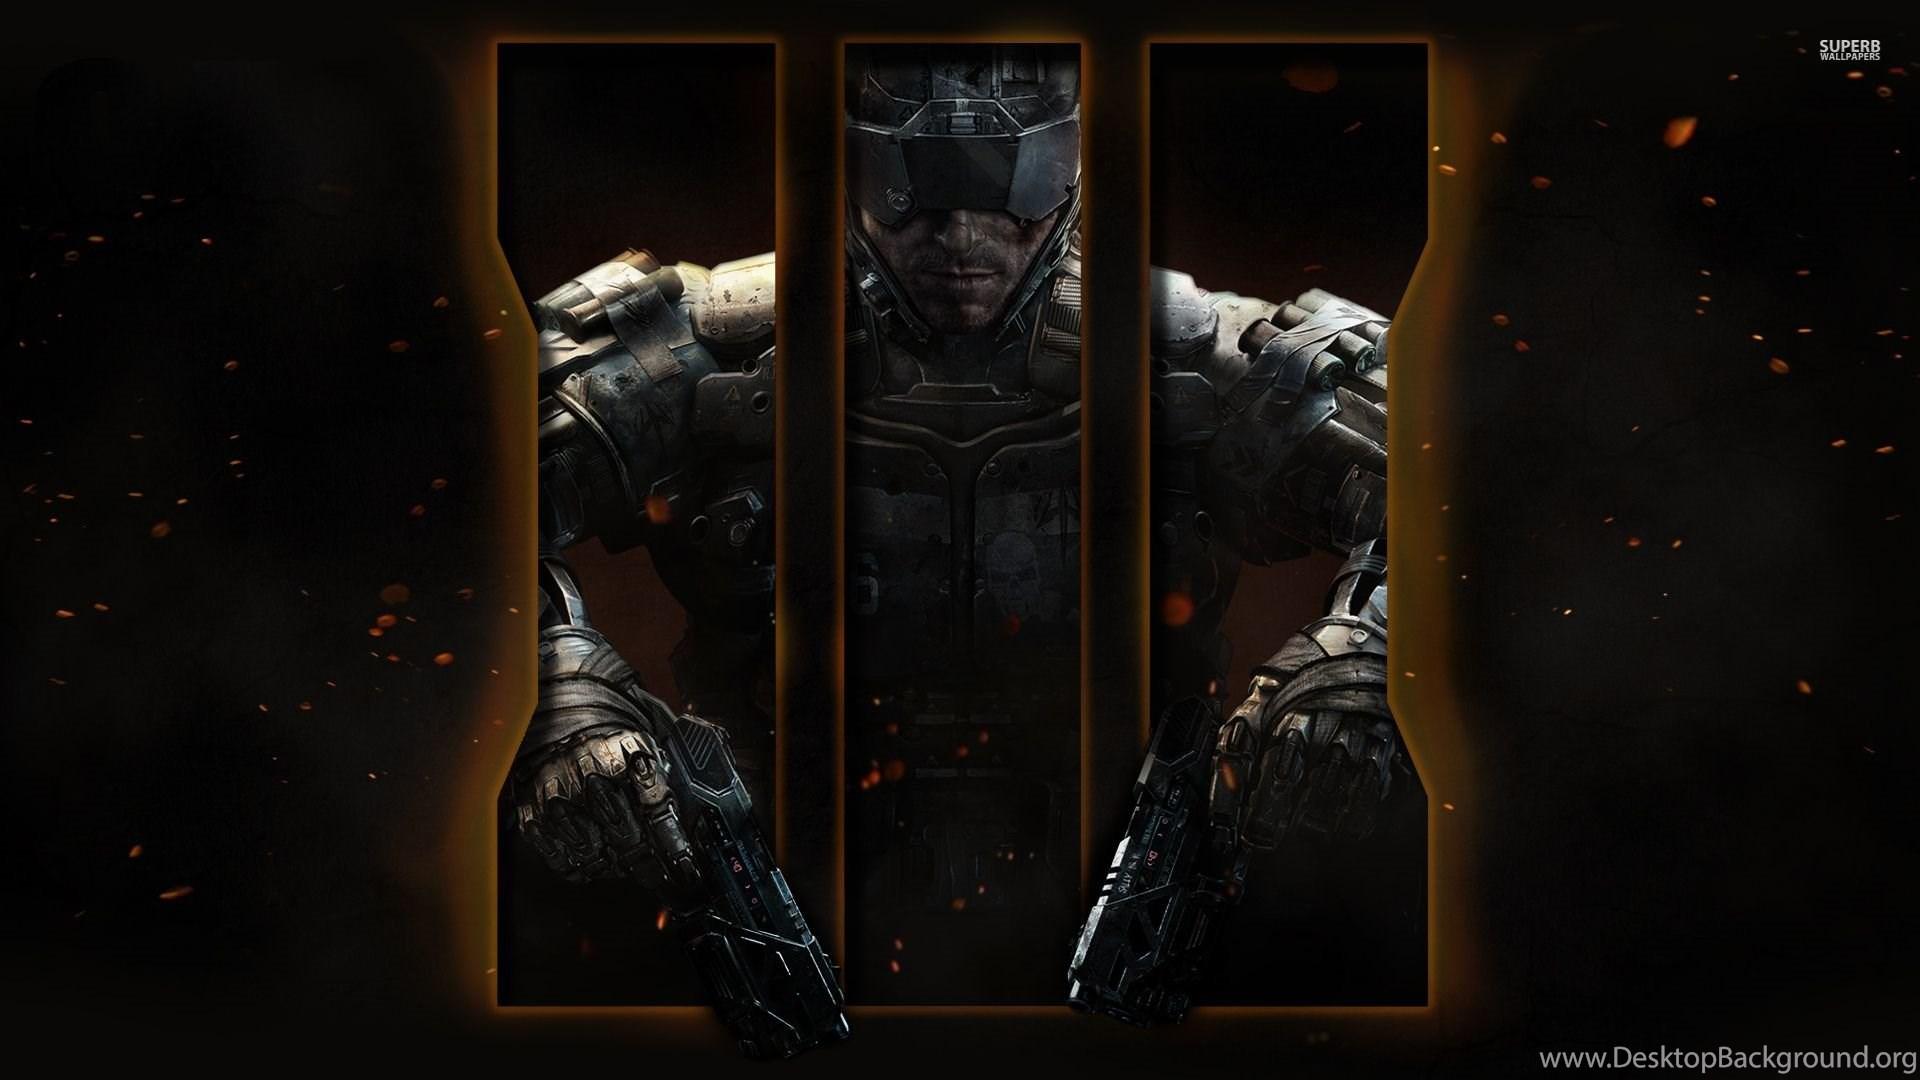 Call Of Duty Black Ops Iii Walpaper 49026 1920x1080 Jpg Desktop